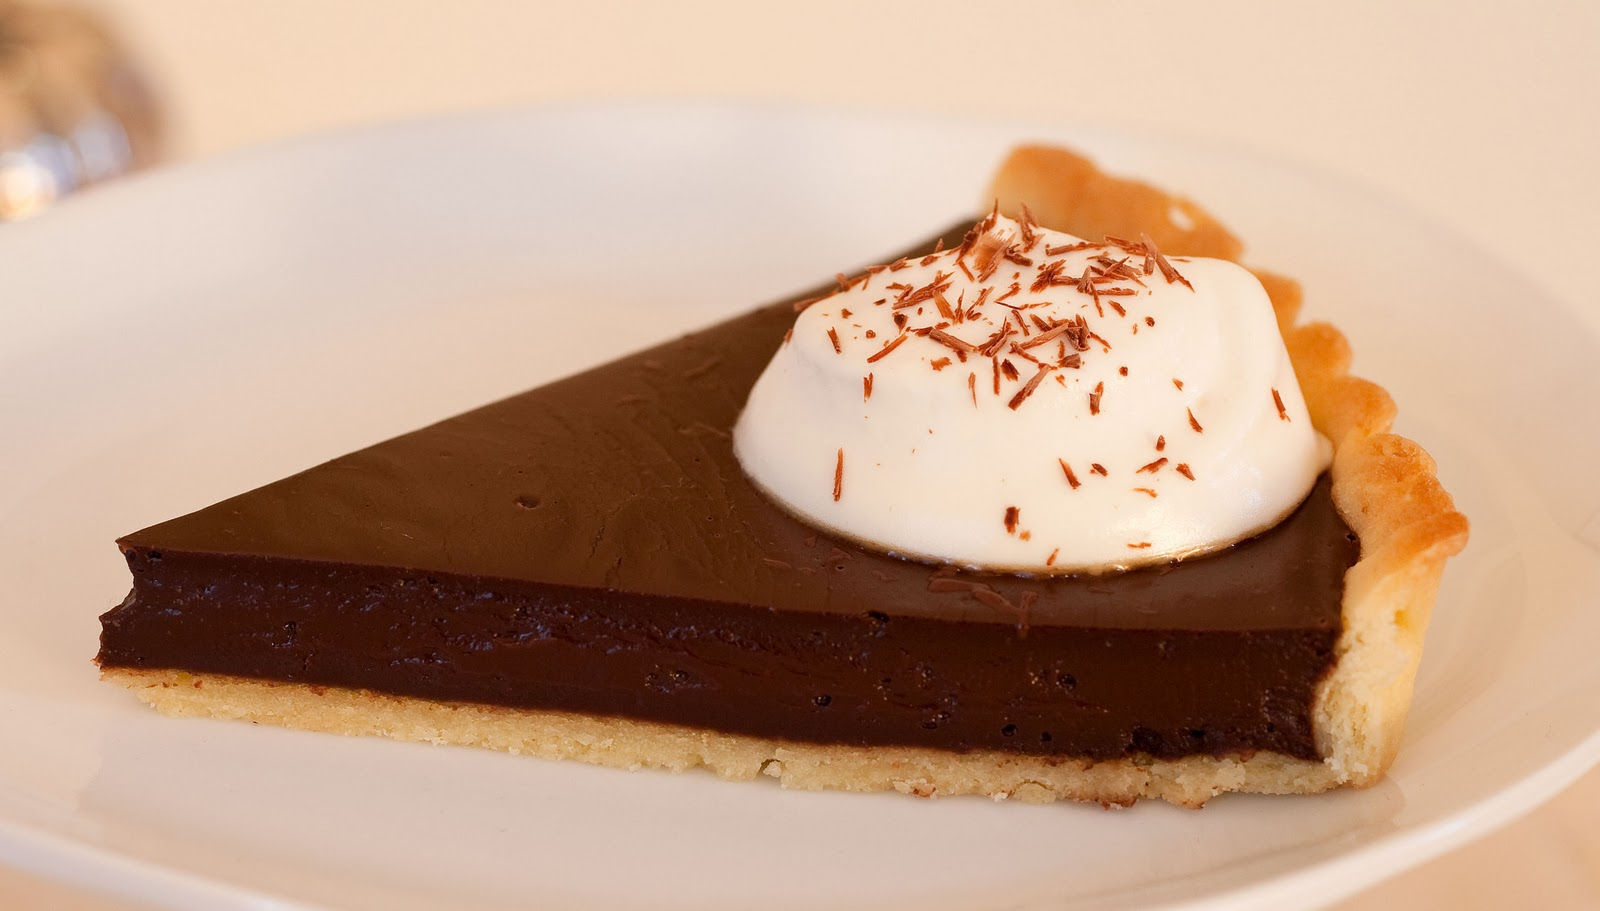 Tish Boyle Sweet Dreams: François Payard's Warm Chocolate Tart